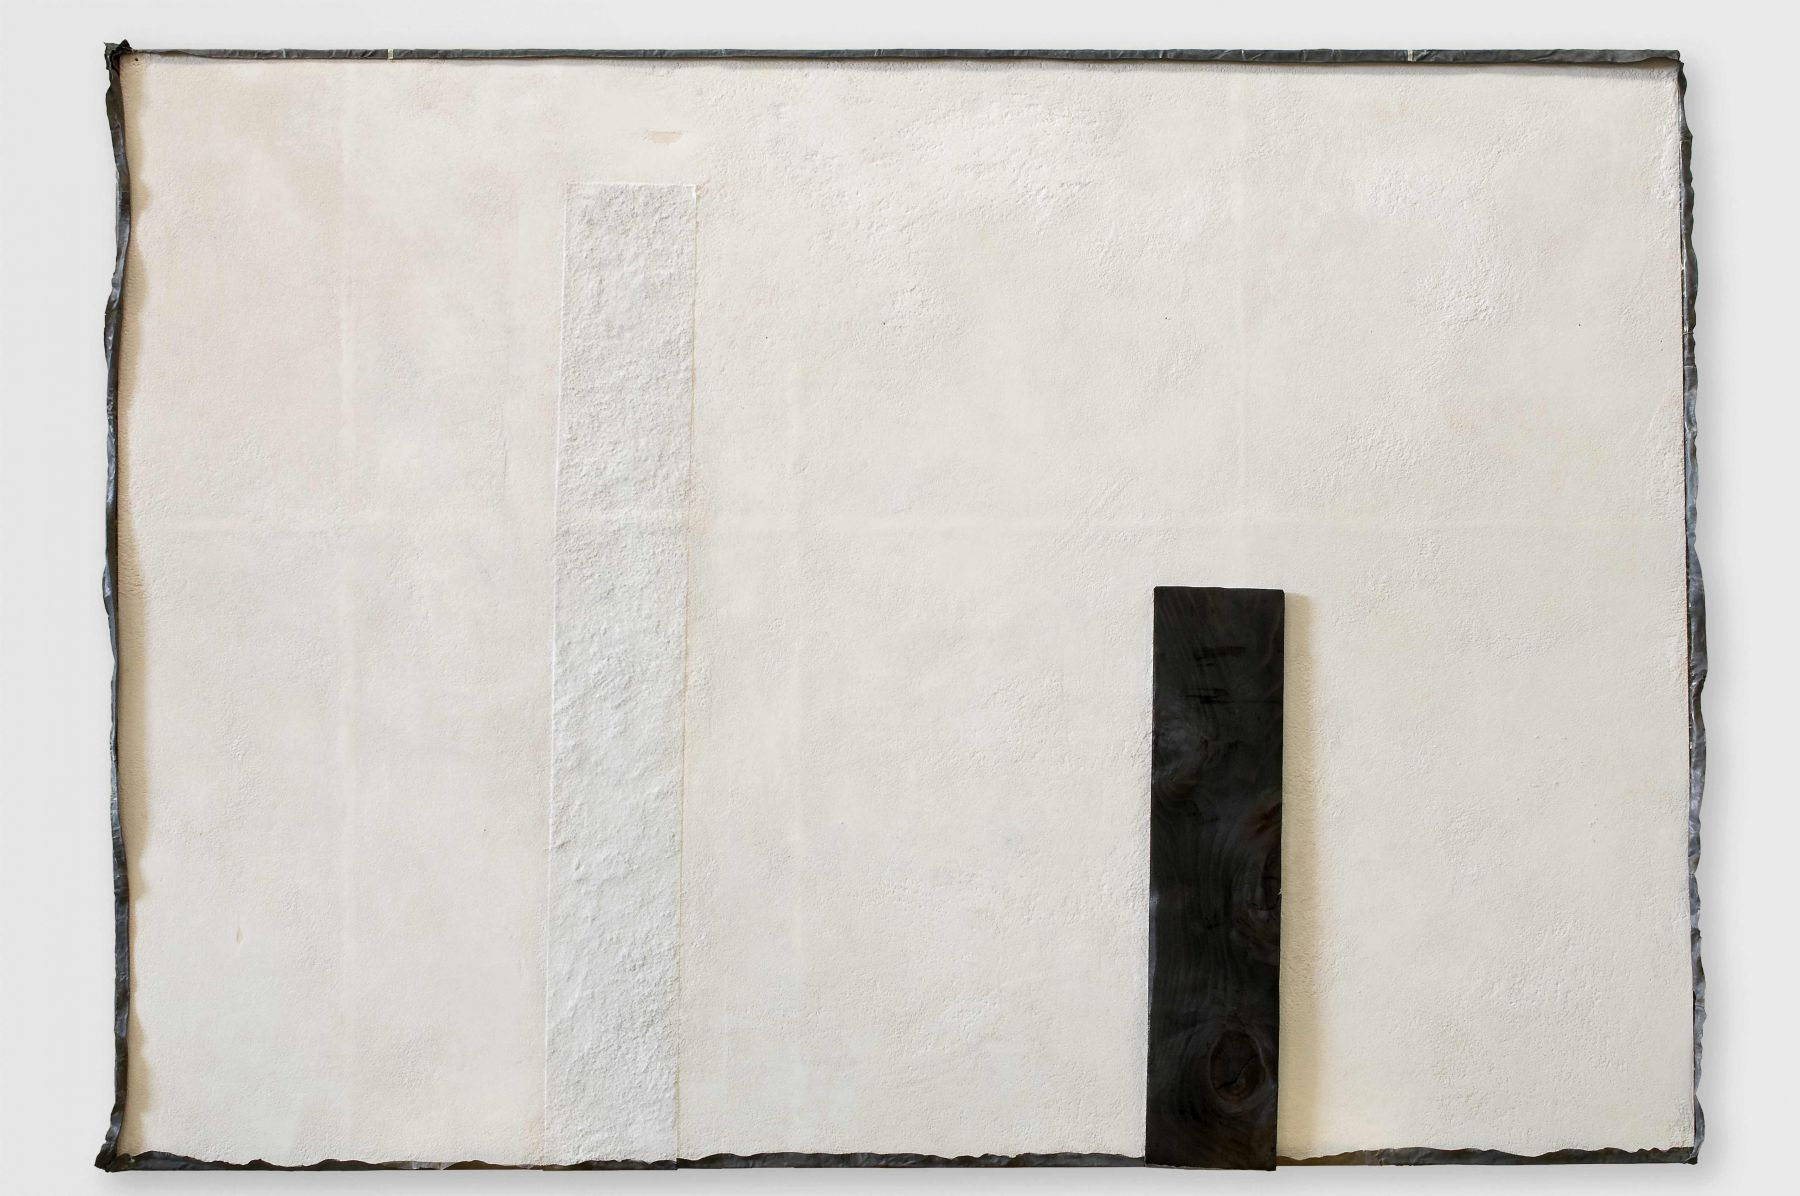 Pier Paolo Calzolari, Untitled, 1986